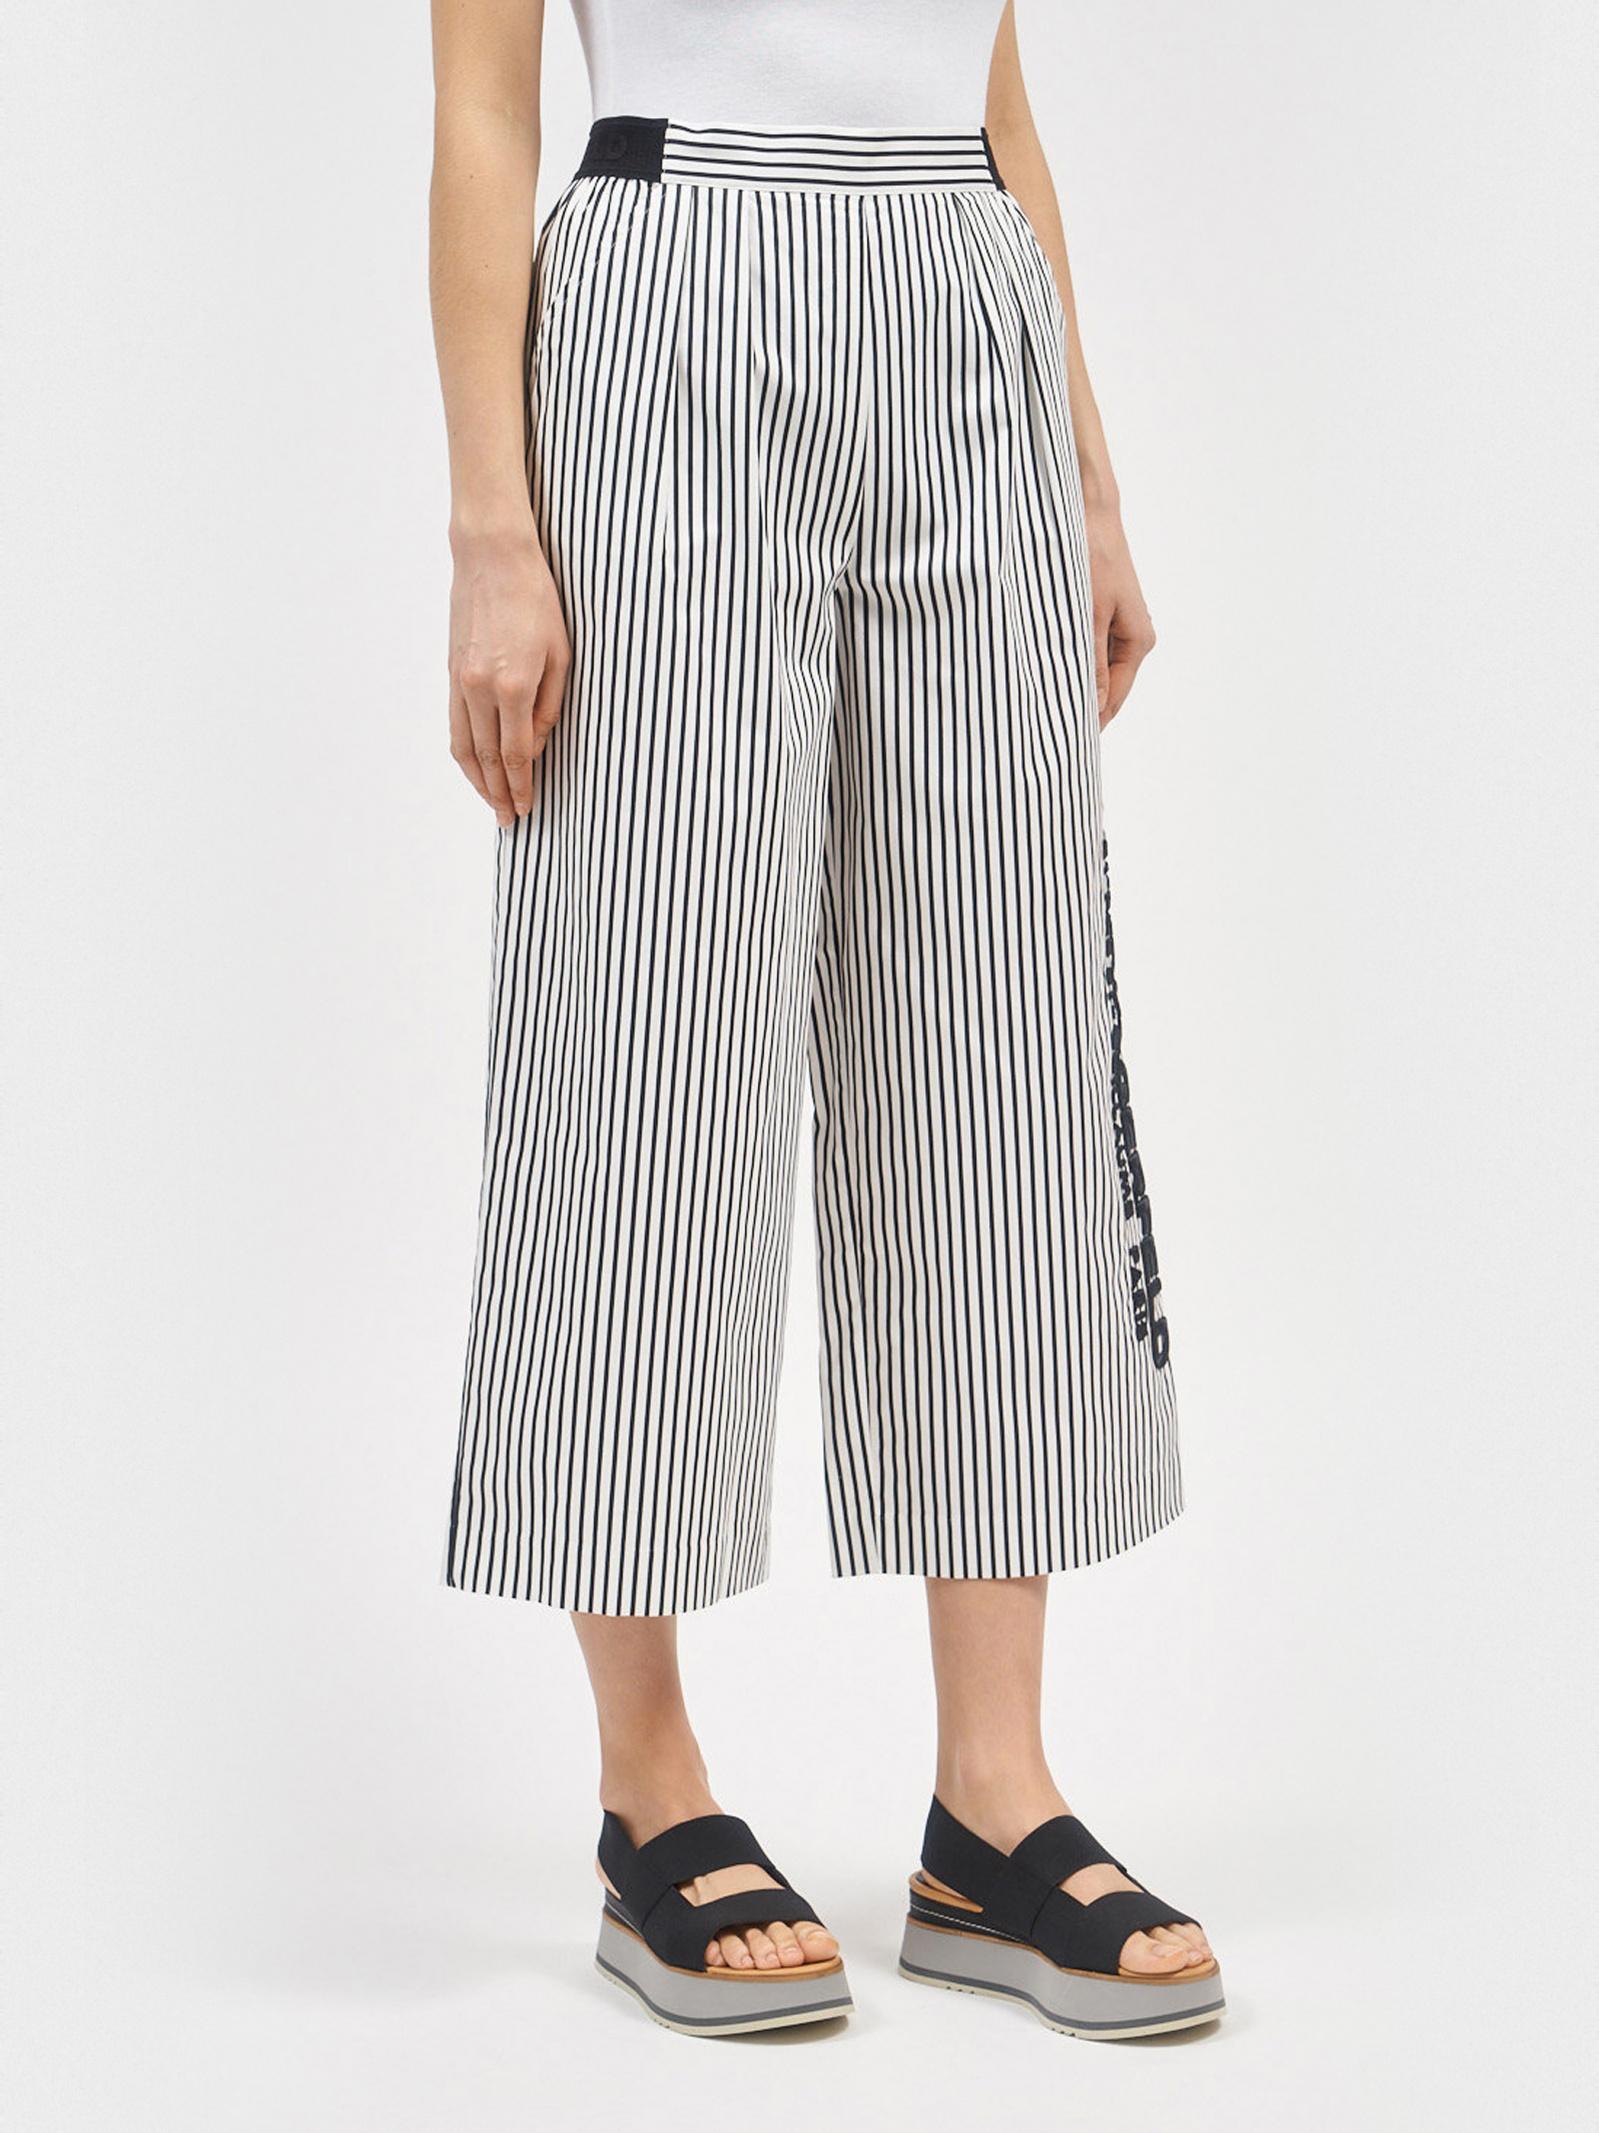 Брюки женские Karl Lagerfeld модель 201W1003_101_0041 приобрести, 2017